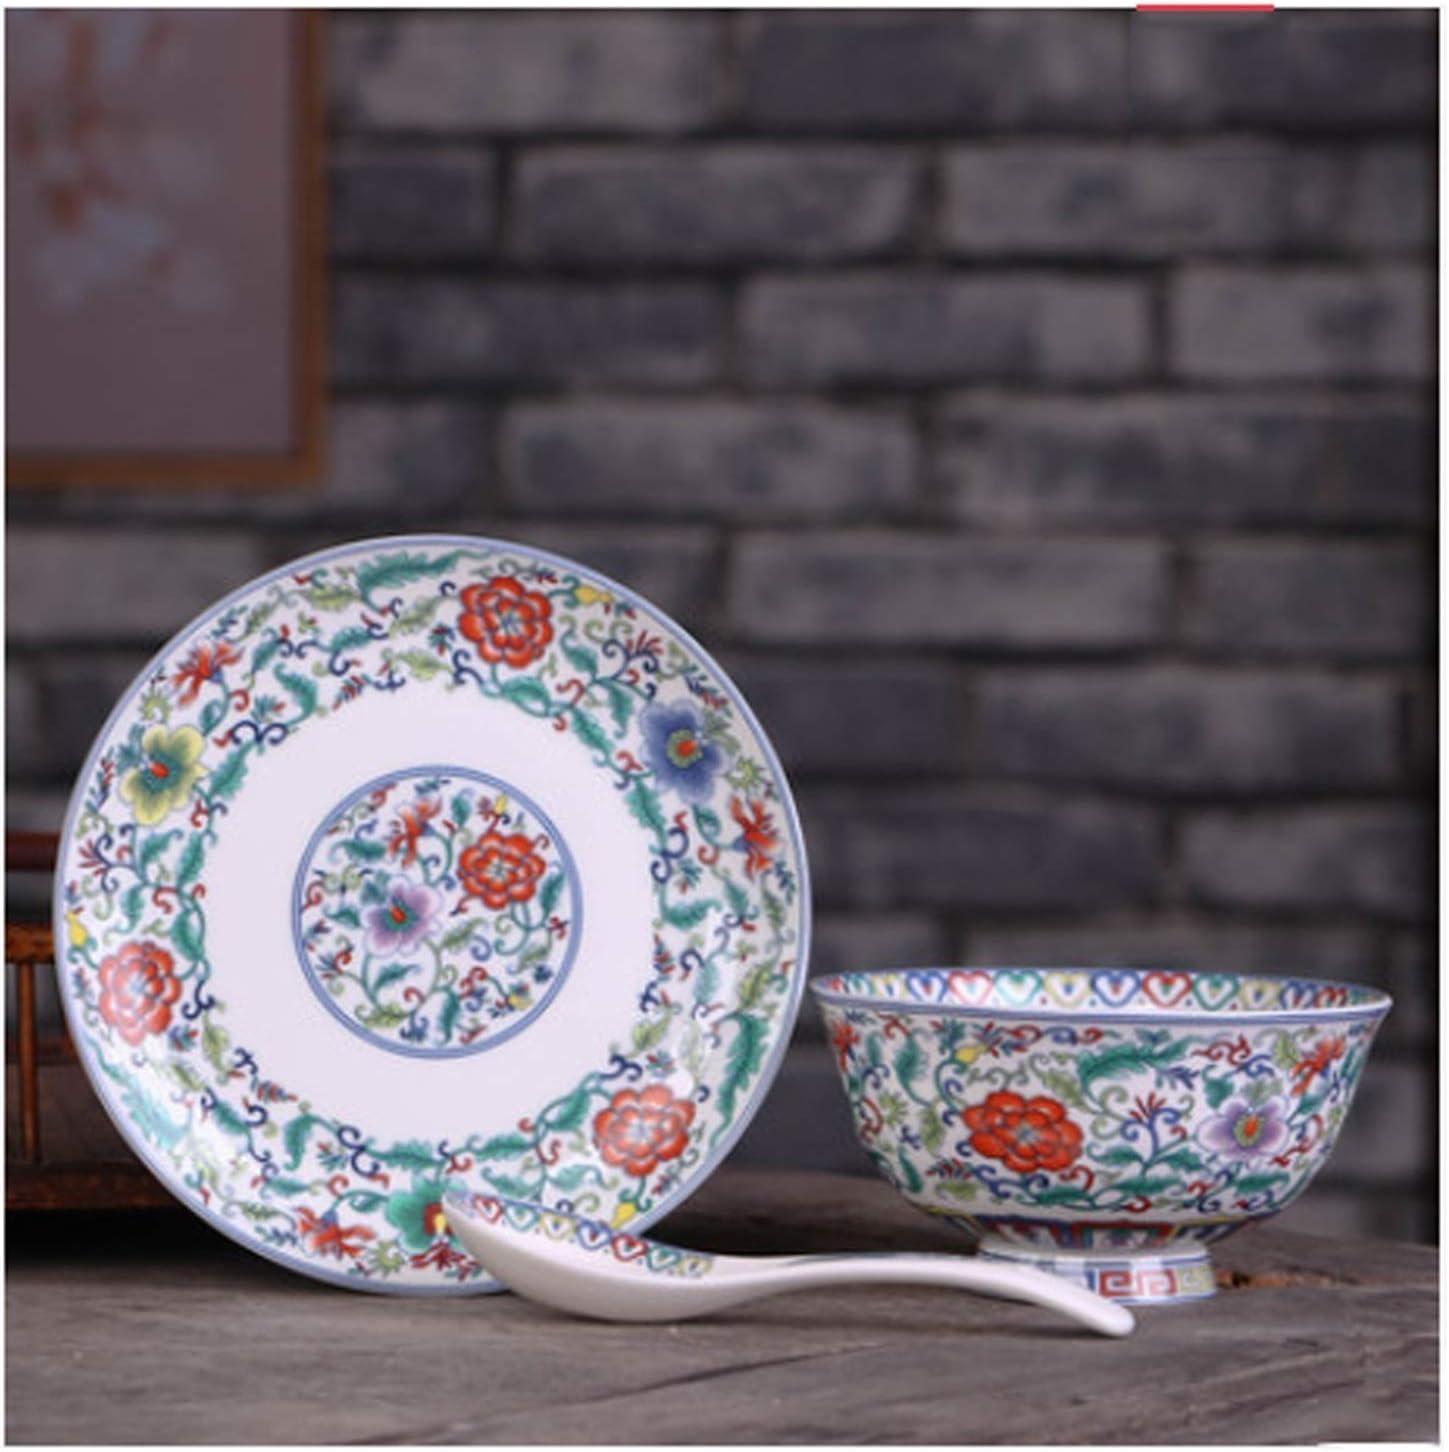 Latest item Dessert Spoon Three-piece set of Chinese china an bone household Ranking TOP5